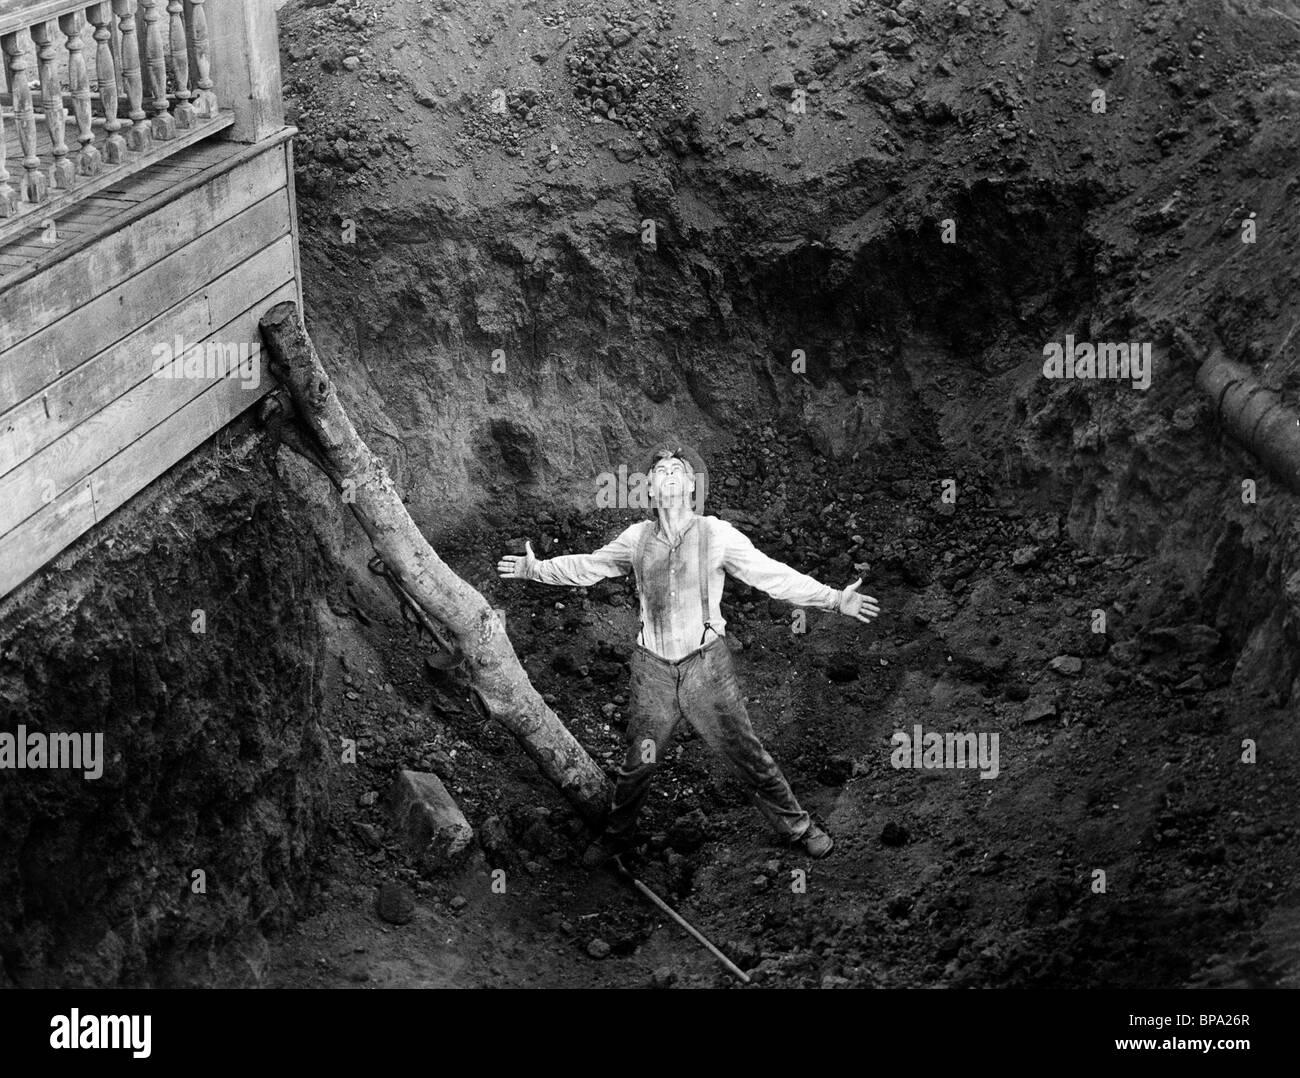 ROBERT RYAN GOD'S LITTLE ACRE (1958) - Stock Image